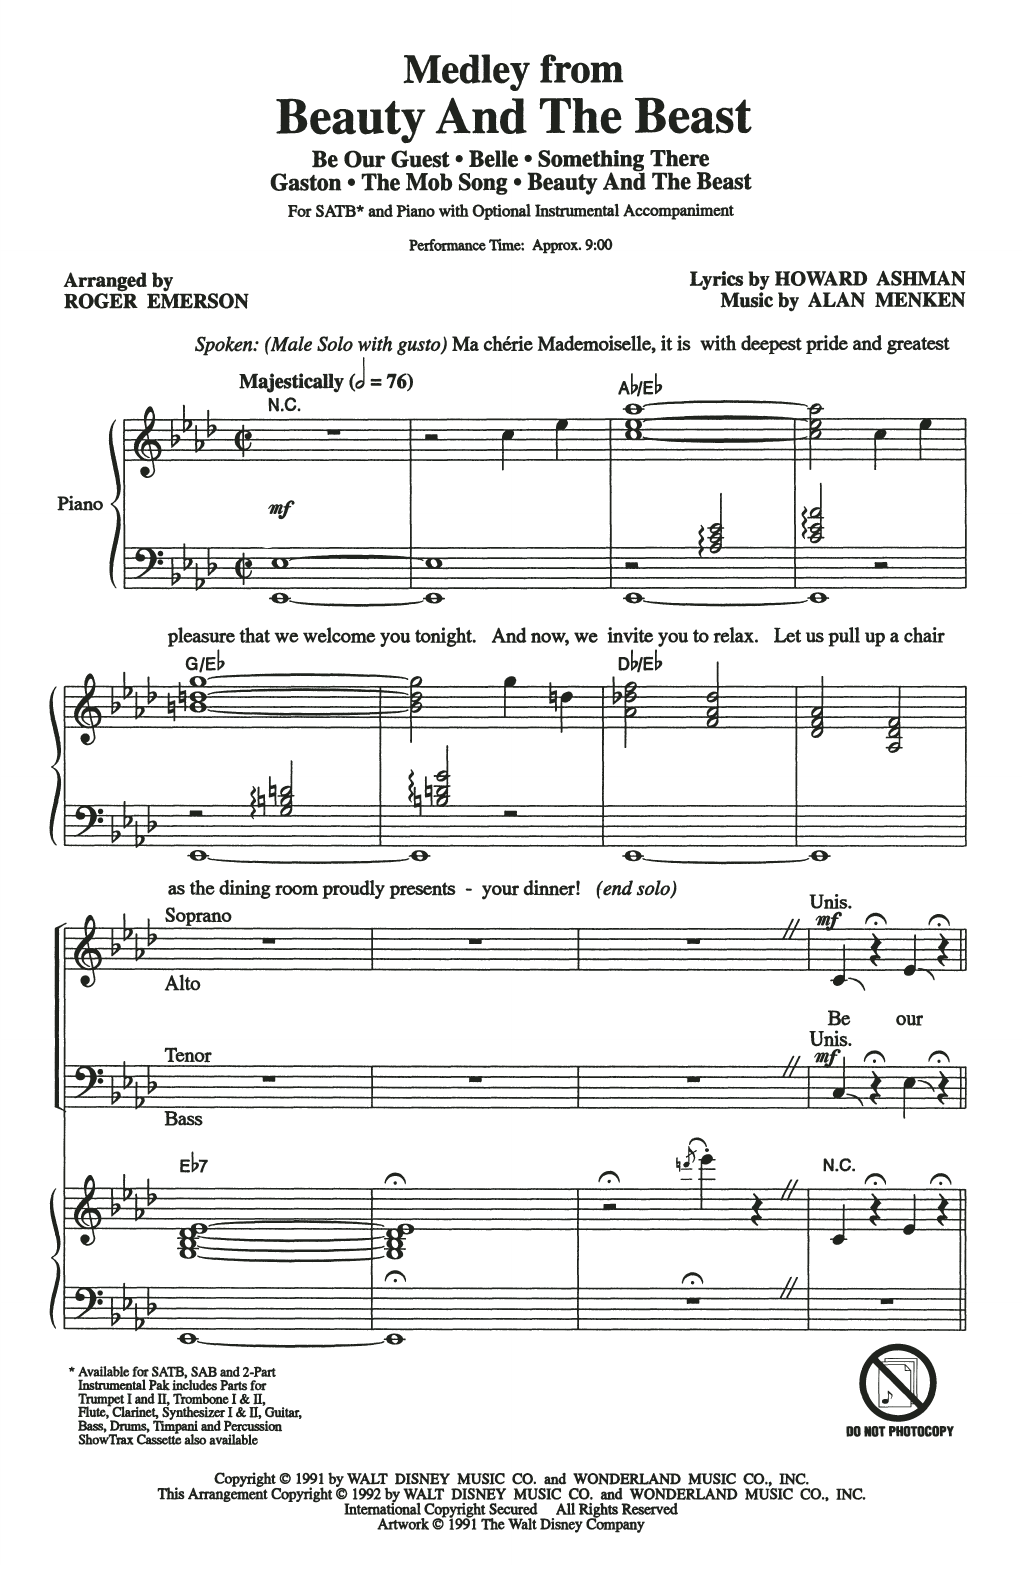 Beauty And The Beast (Medley) (arr. Roger Emerson) (SATB Choir)